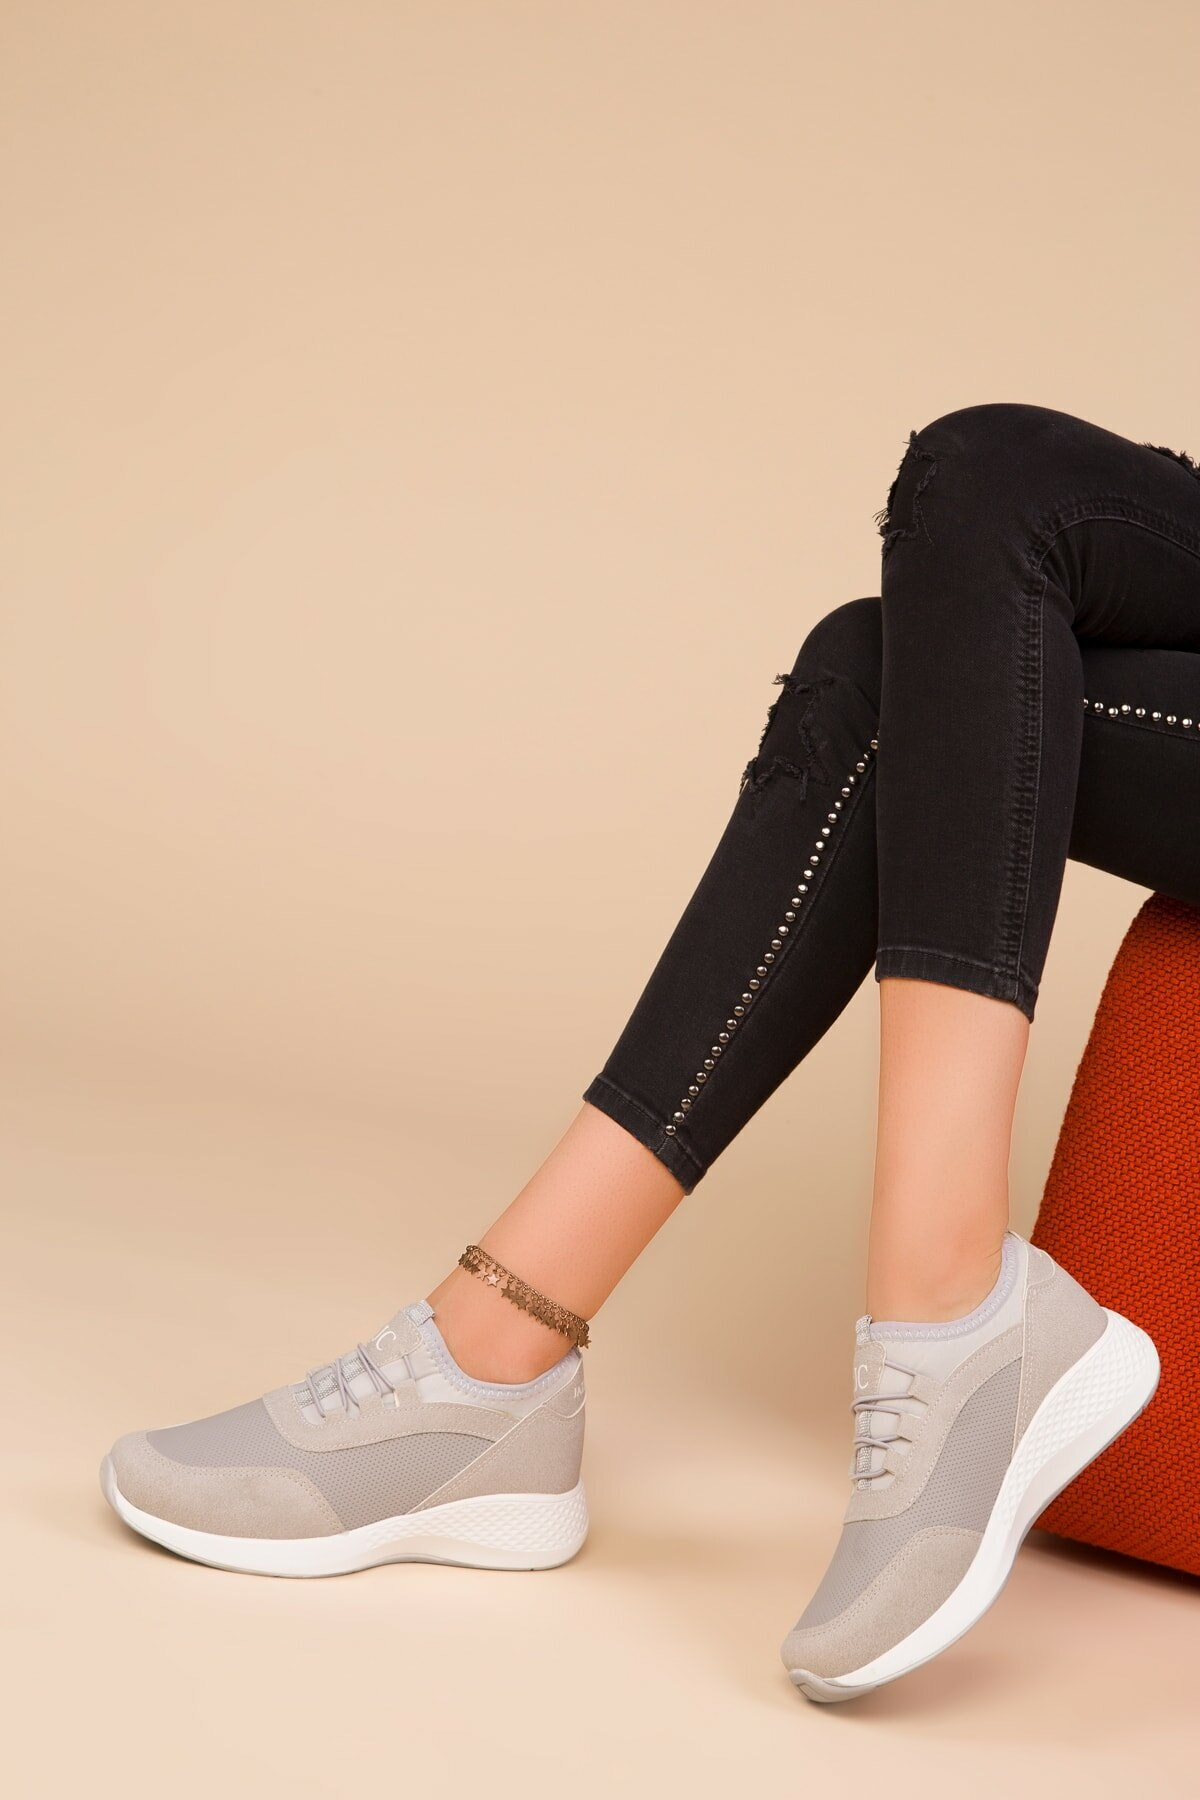 Women Casual Shoes Fashion Breathable Walking Mesh Flat Shoes Woman White Sneakers Women 2021 Tenis